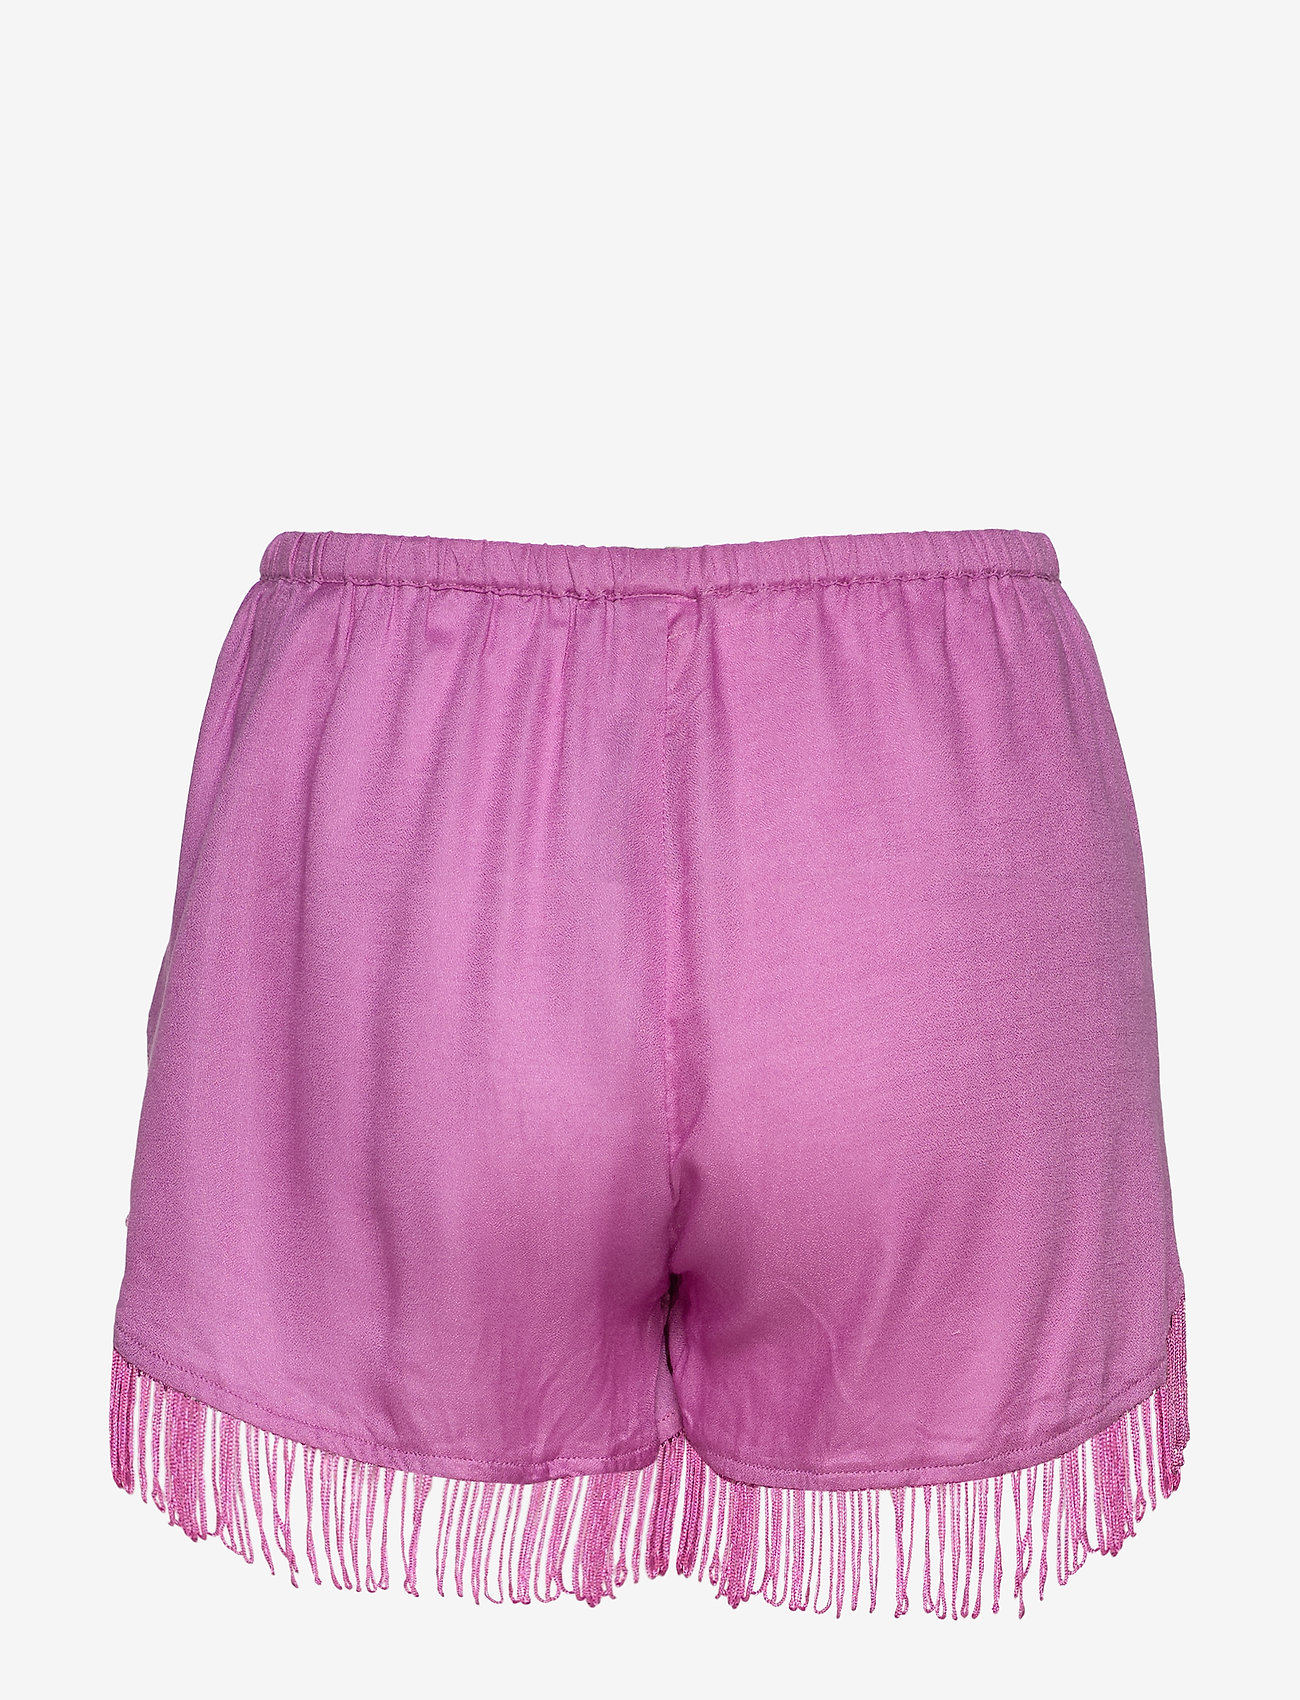 Underprotection - CECILIE SHORTS PURPLE - shorts - purple - 1